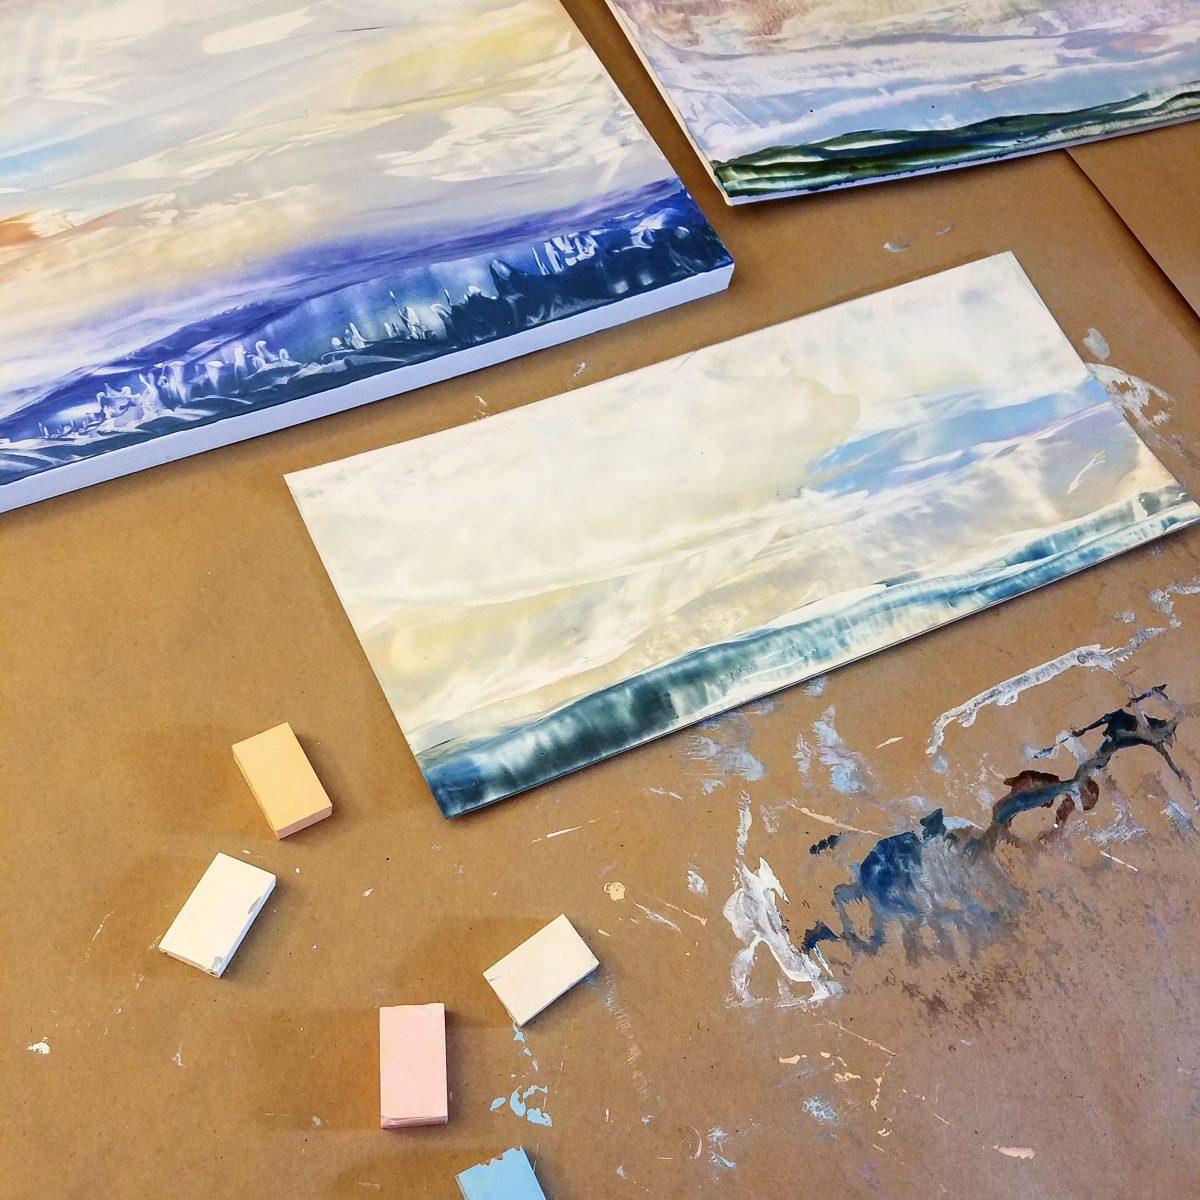 Encaustic Artist Residency: Day 1, Gathering Inspiration